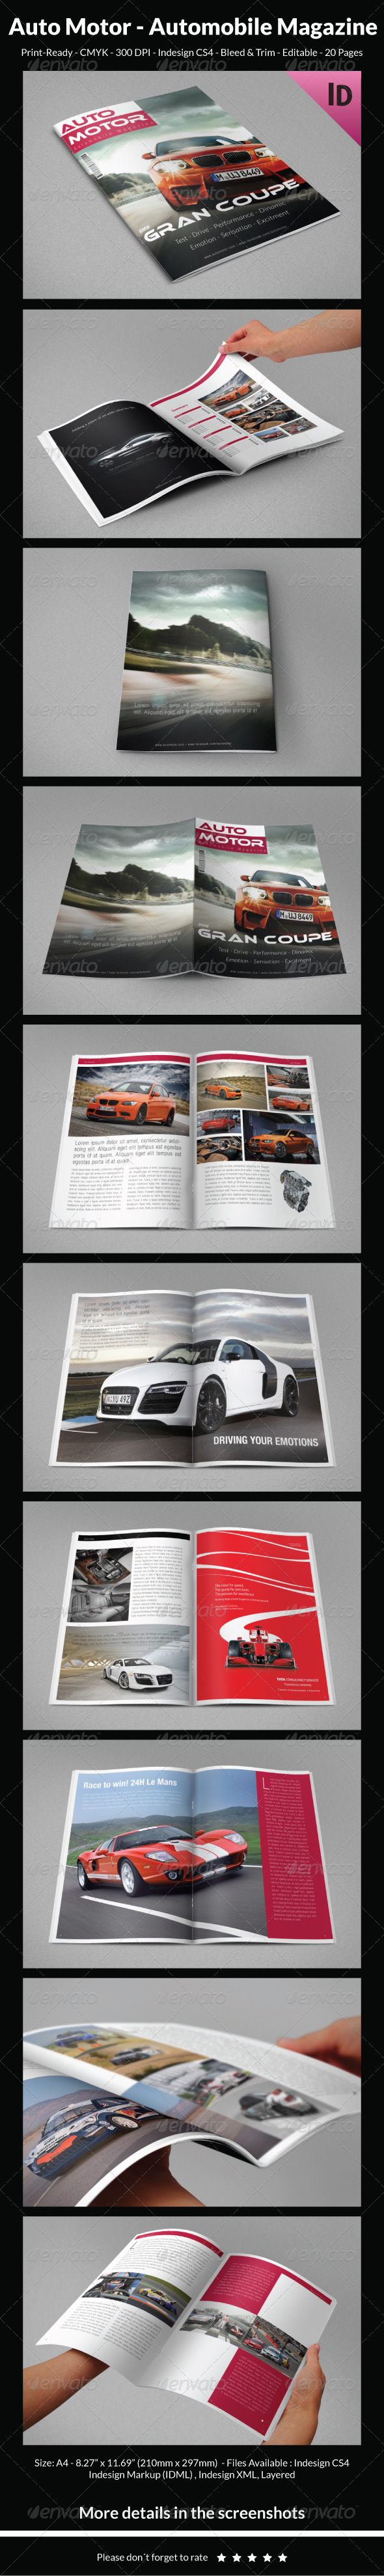 Auto Motor - Automobile Magazine - Magazines Print Templates